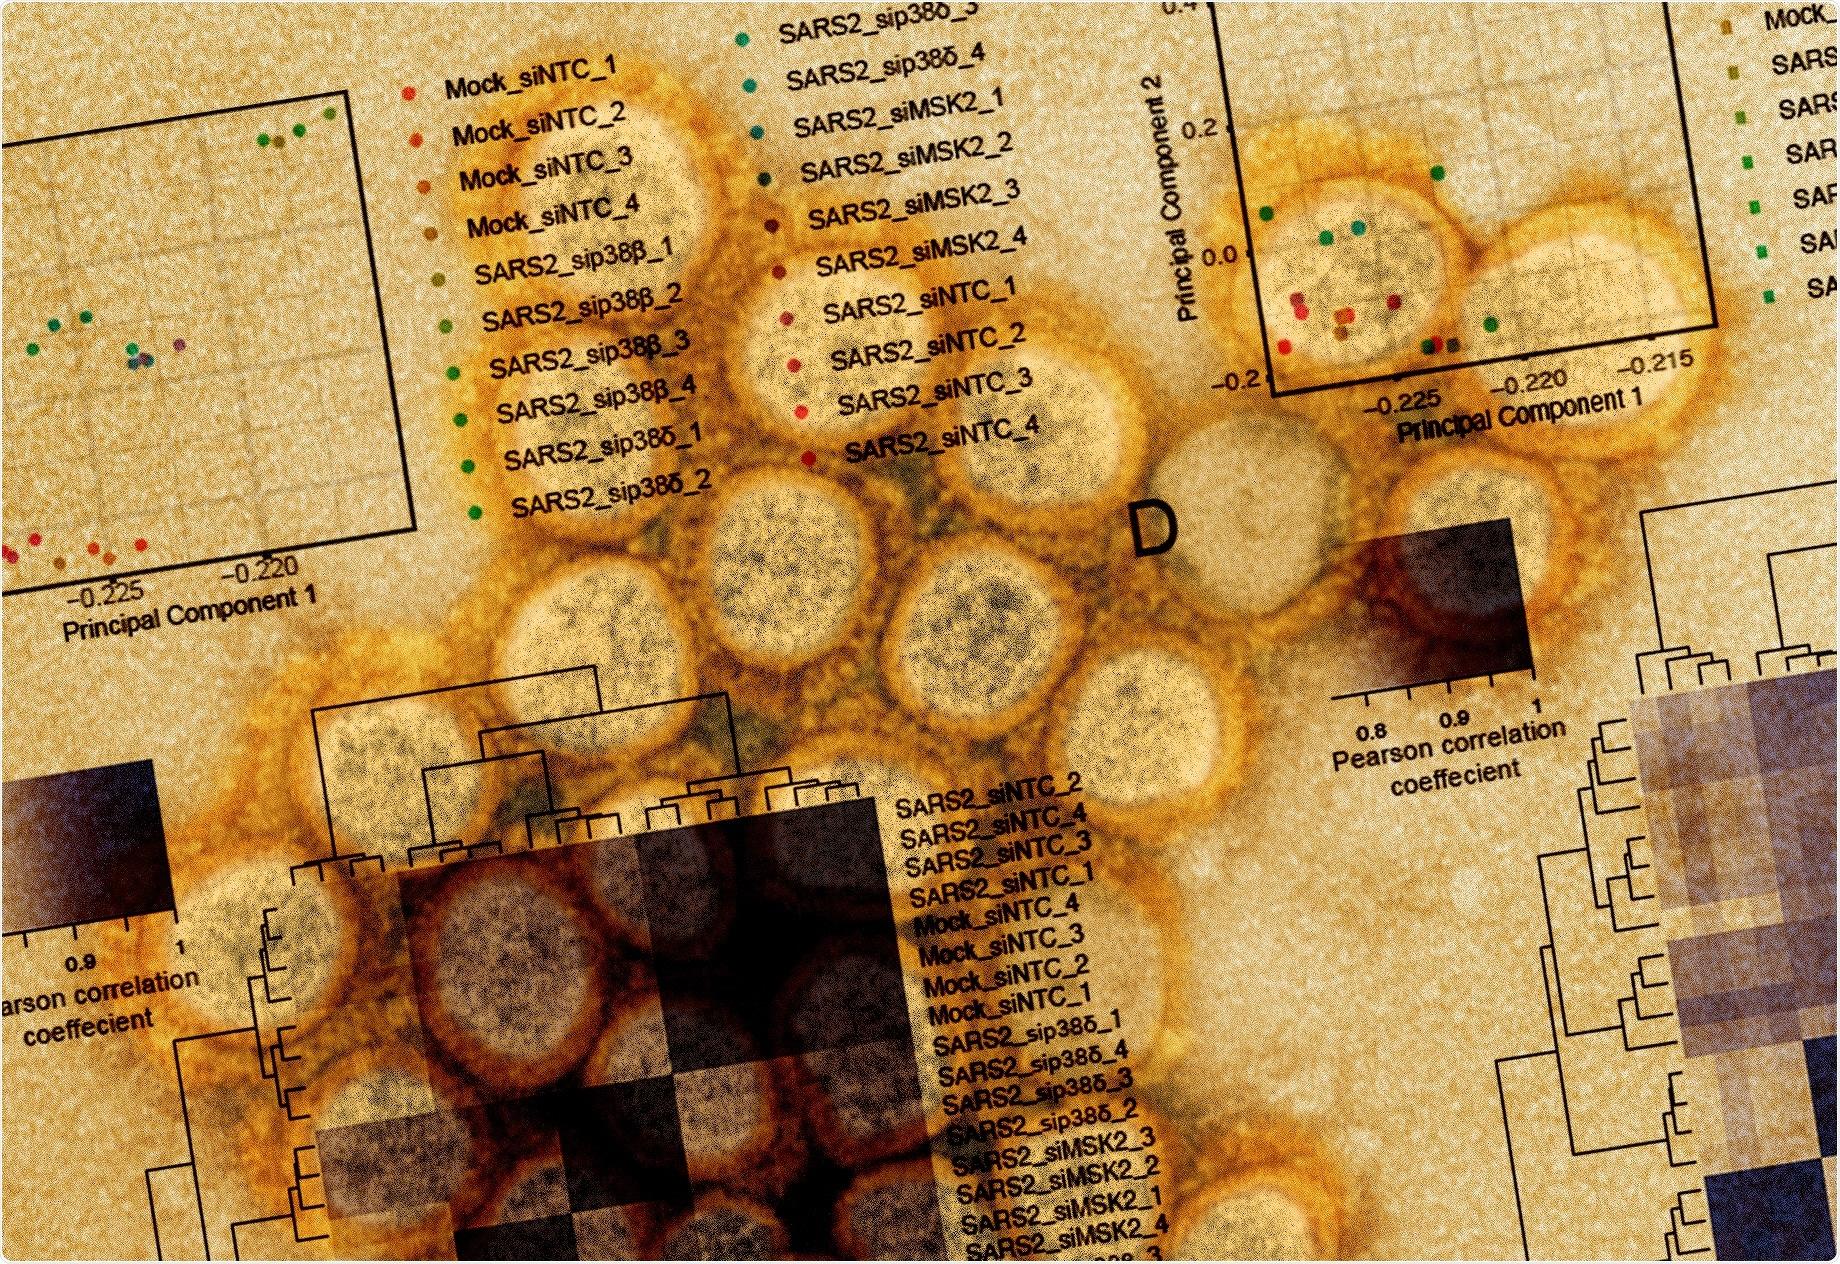 Study: SARS-CoV-2 hijacks p38ß/MAPK11 to promote viral protein translation. Image Credit: NIAID